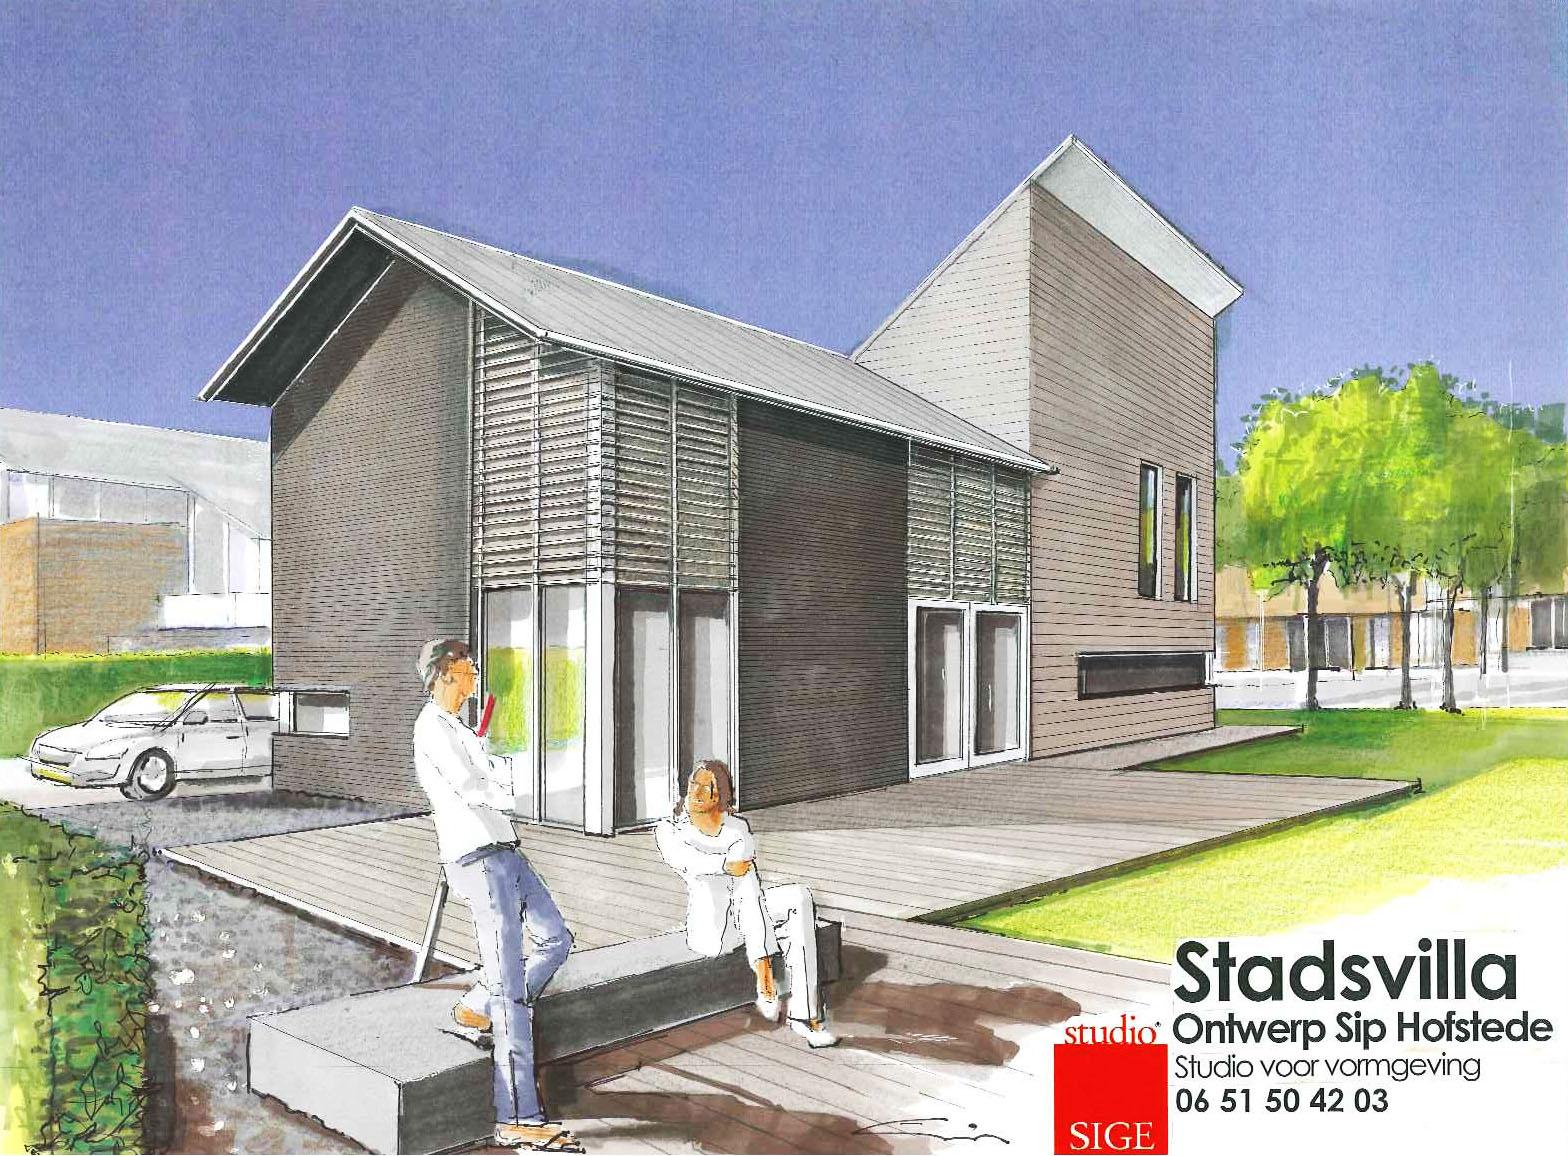 Sip hofstede exterieur bouwkundig ontwerpen - Tuin ontwerp exterieur ontwerp ...